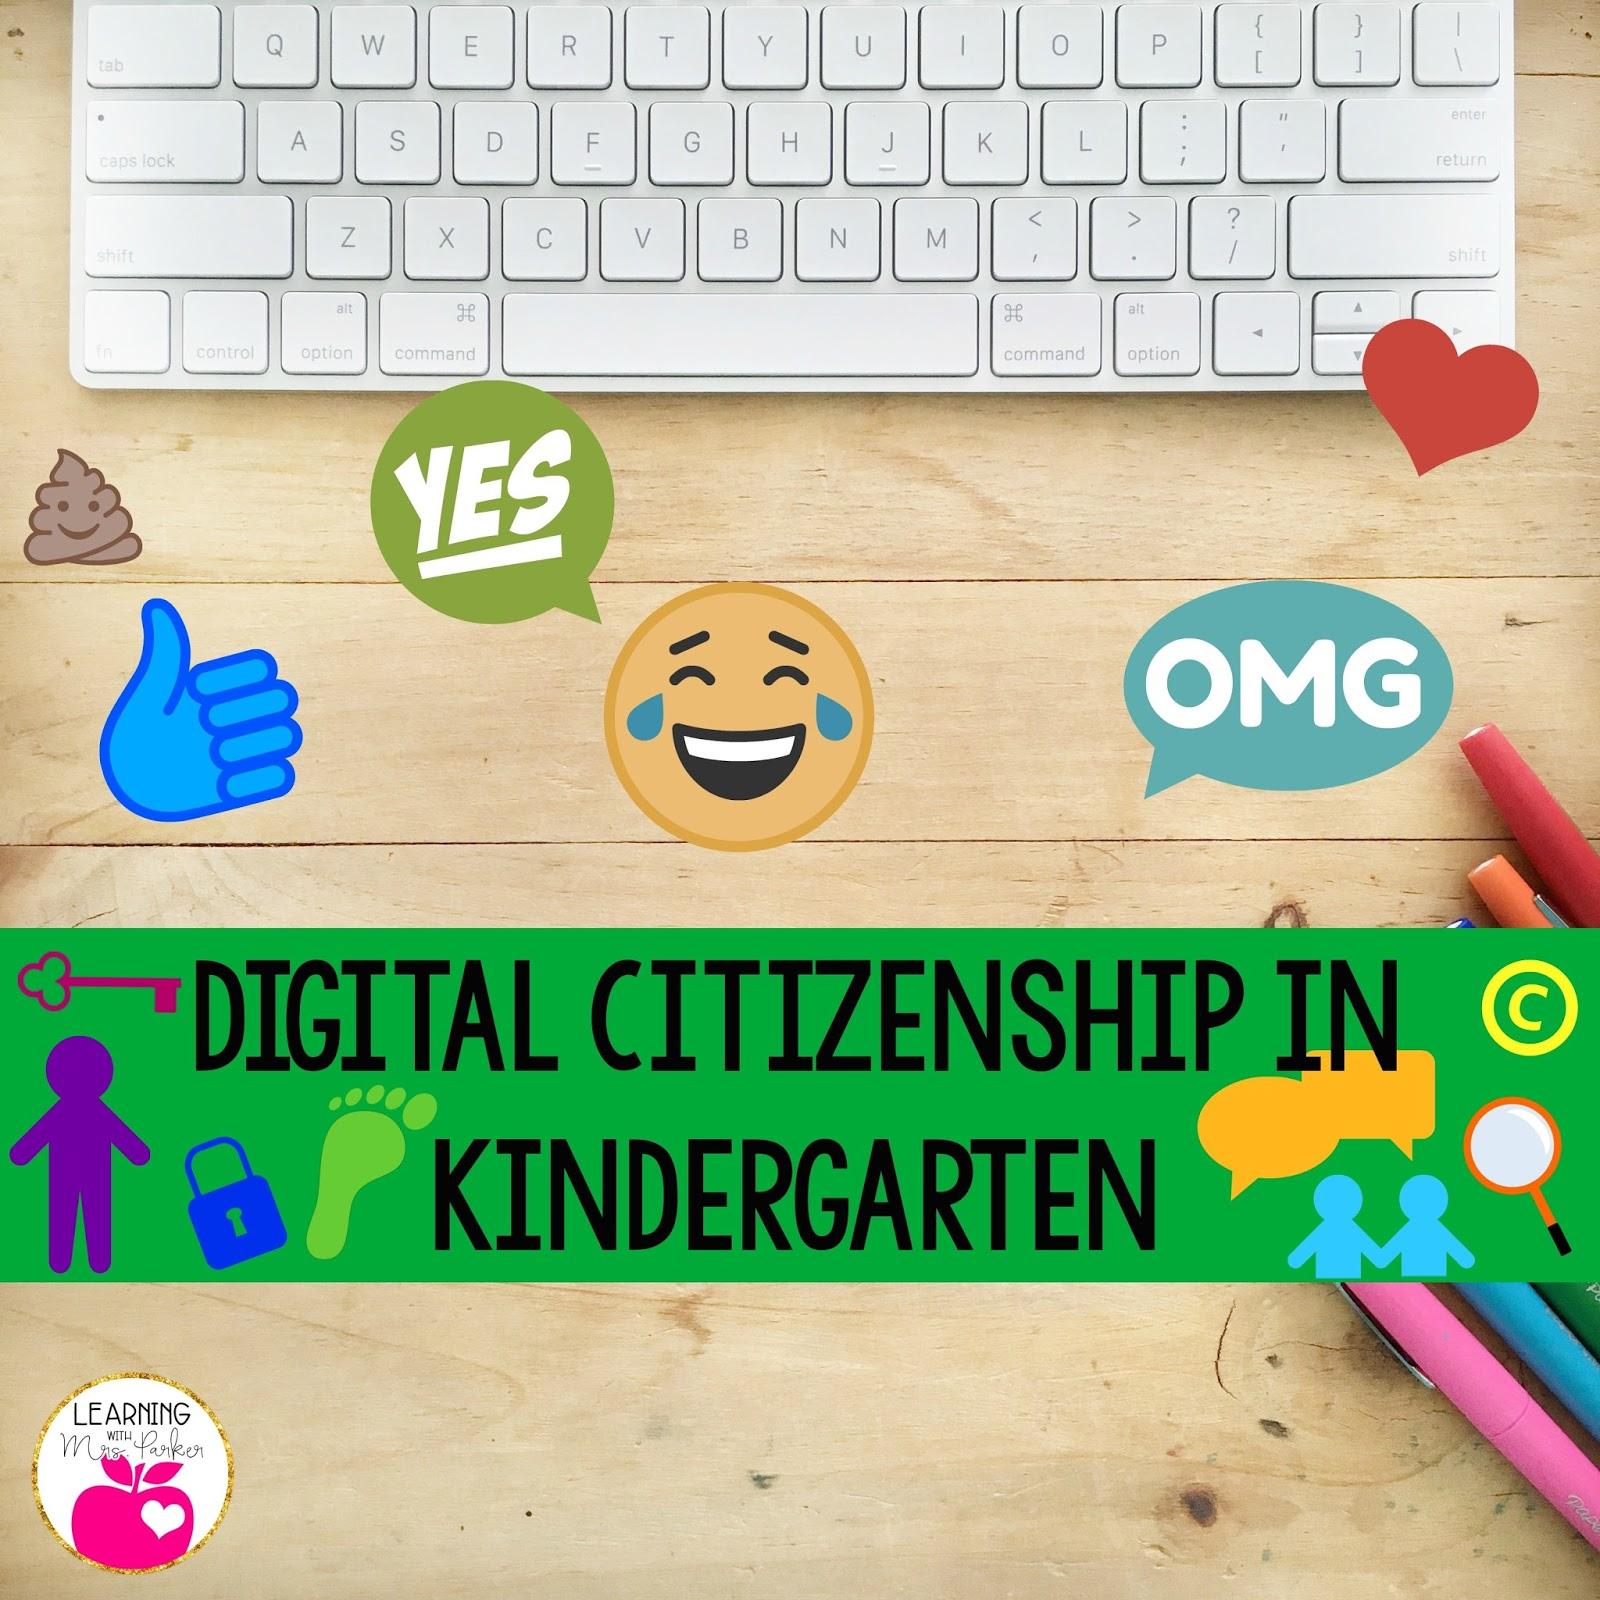 Digital Citizenship In Kindergarten